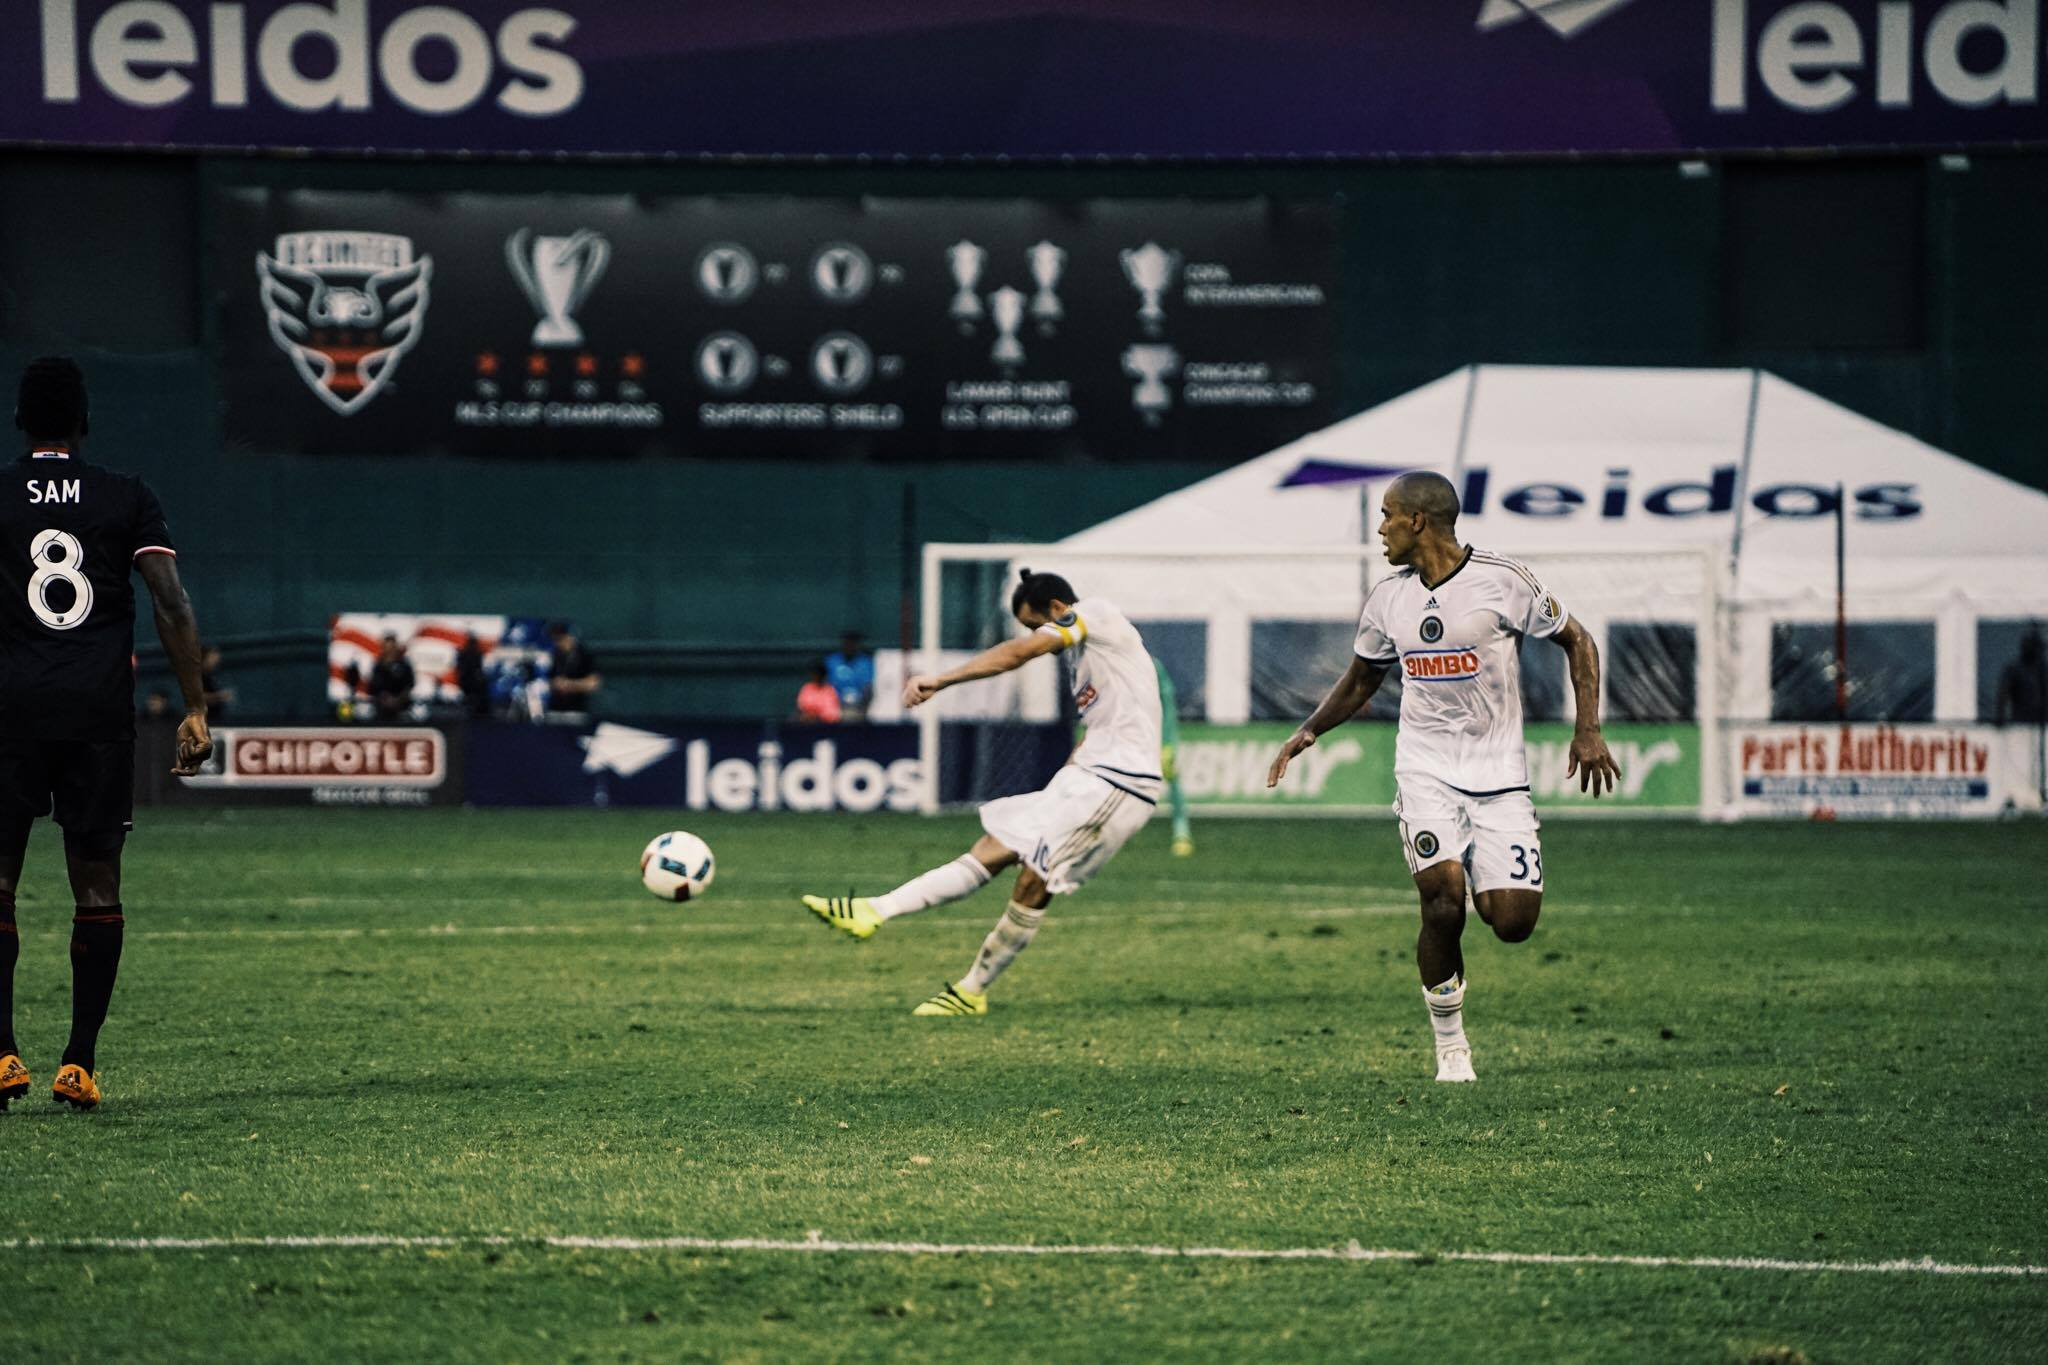 Tranquillo Barnetta lines up to take a free kick